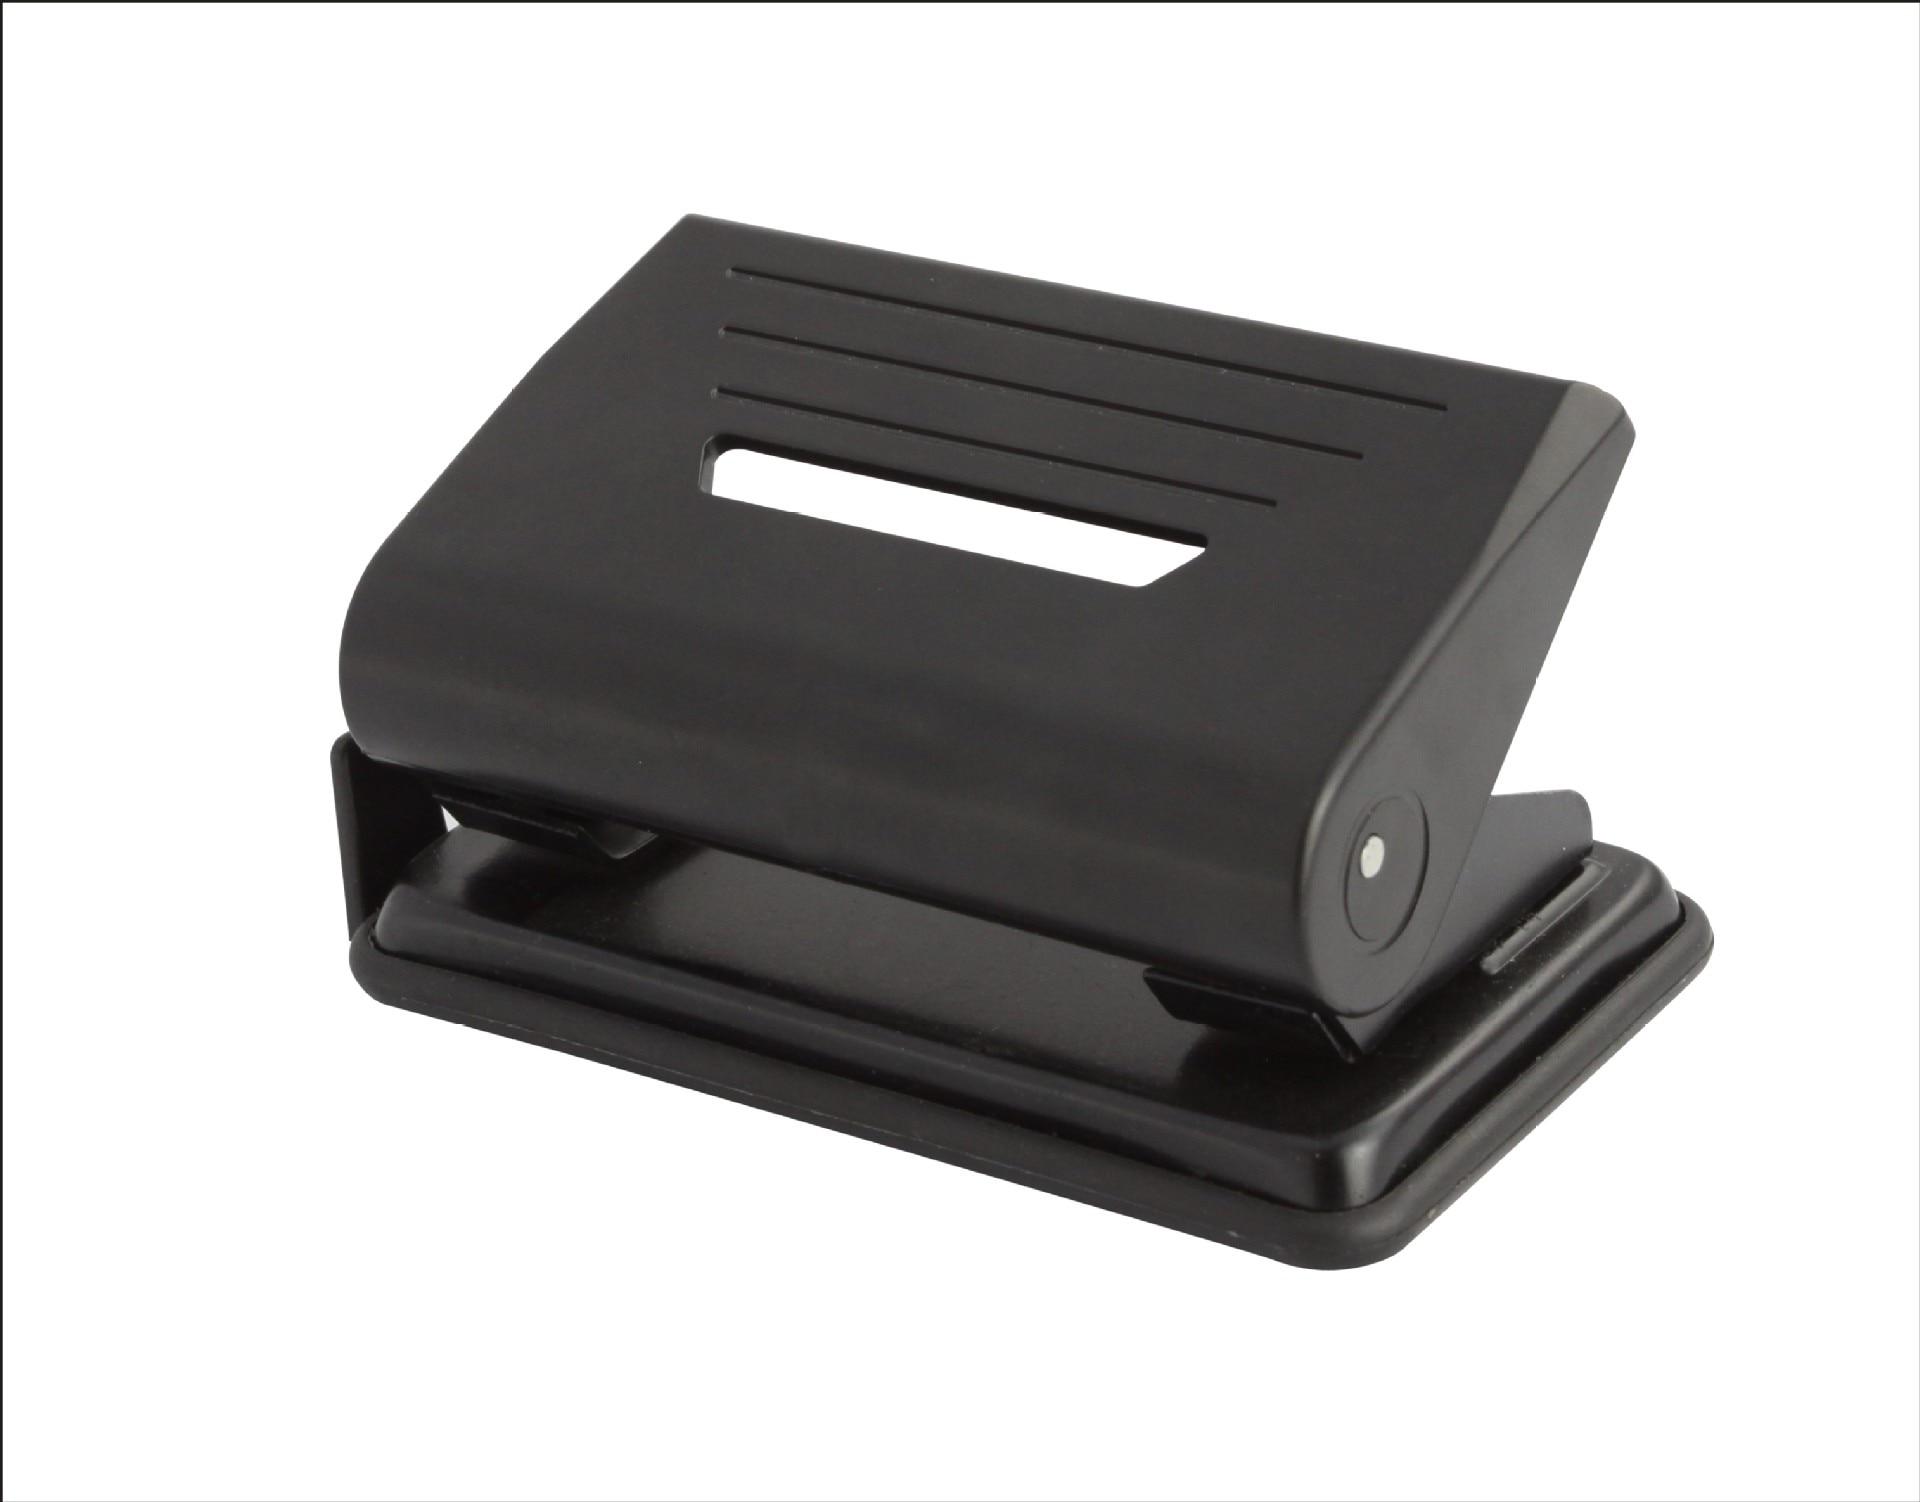 Perforadora de oficina de dos agujeros perforadora de dos agujeros con regla de 20 piezas